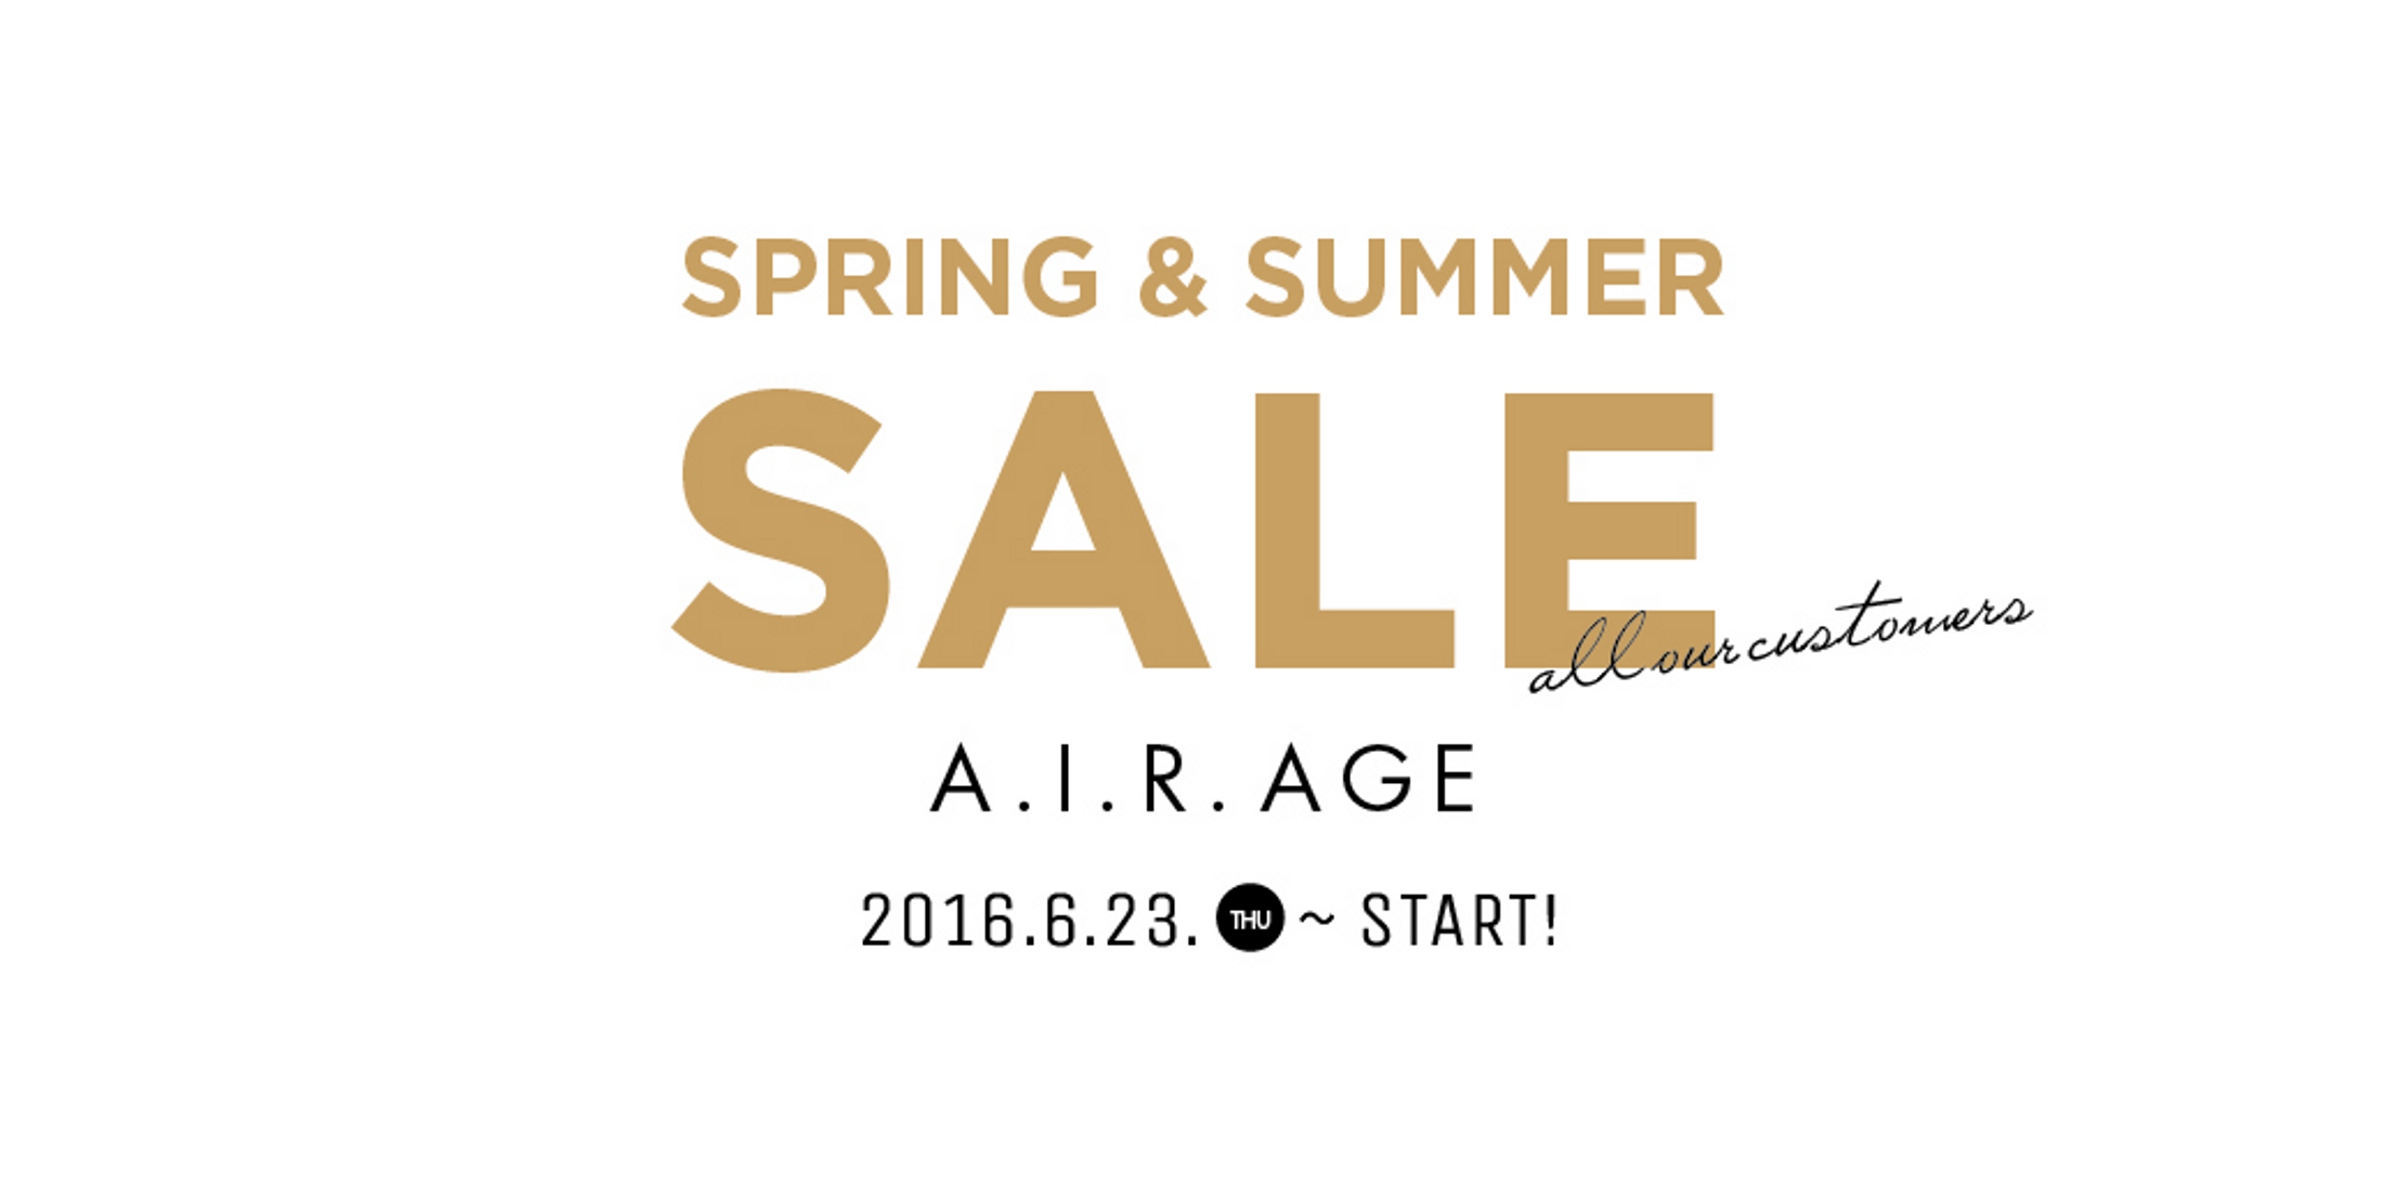 2016 spring & summer sale